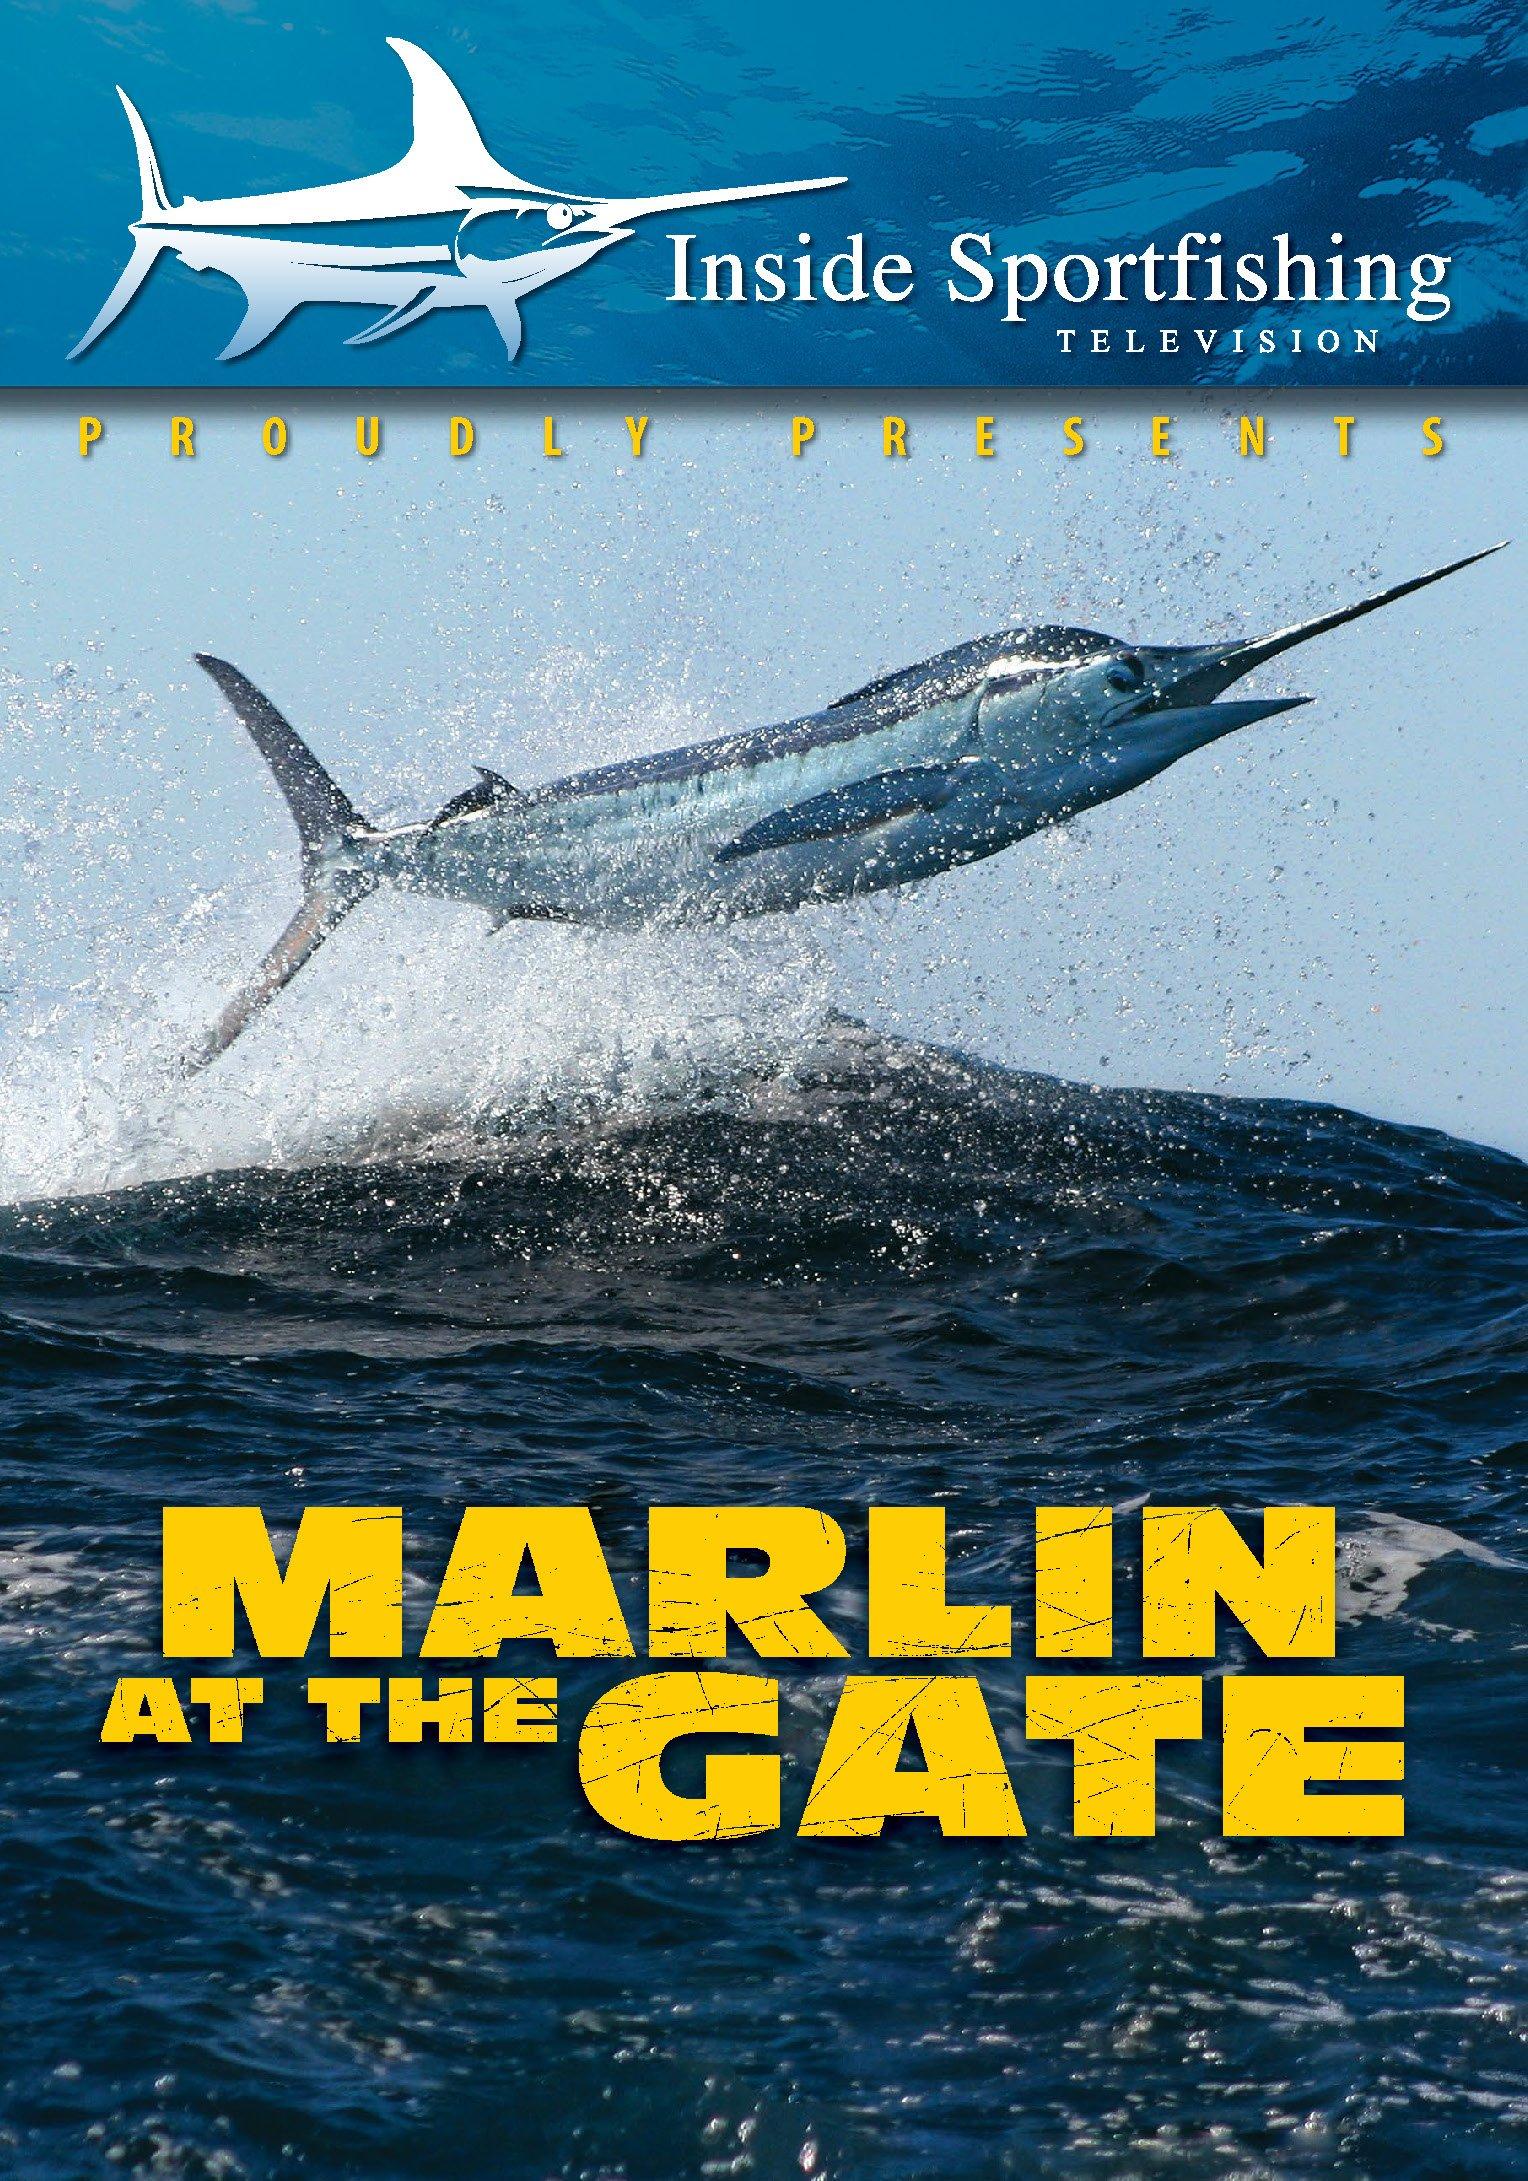 DVD : Inside Sportfishing: Marlin At The Gate - Cabo San Lucas (DVD)